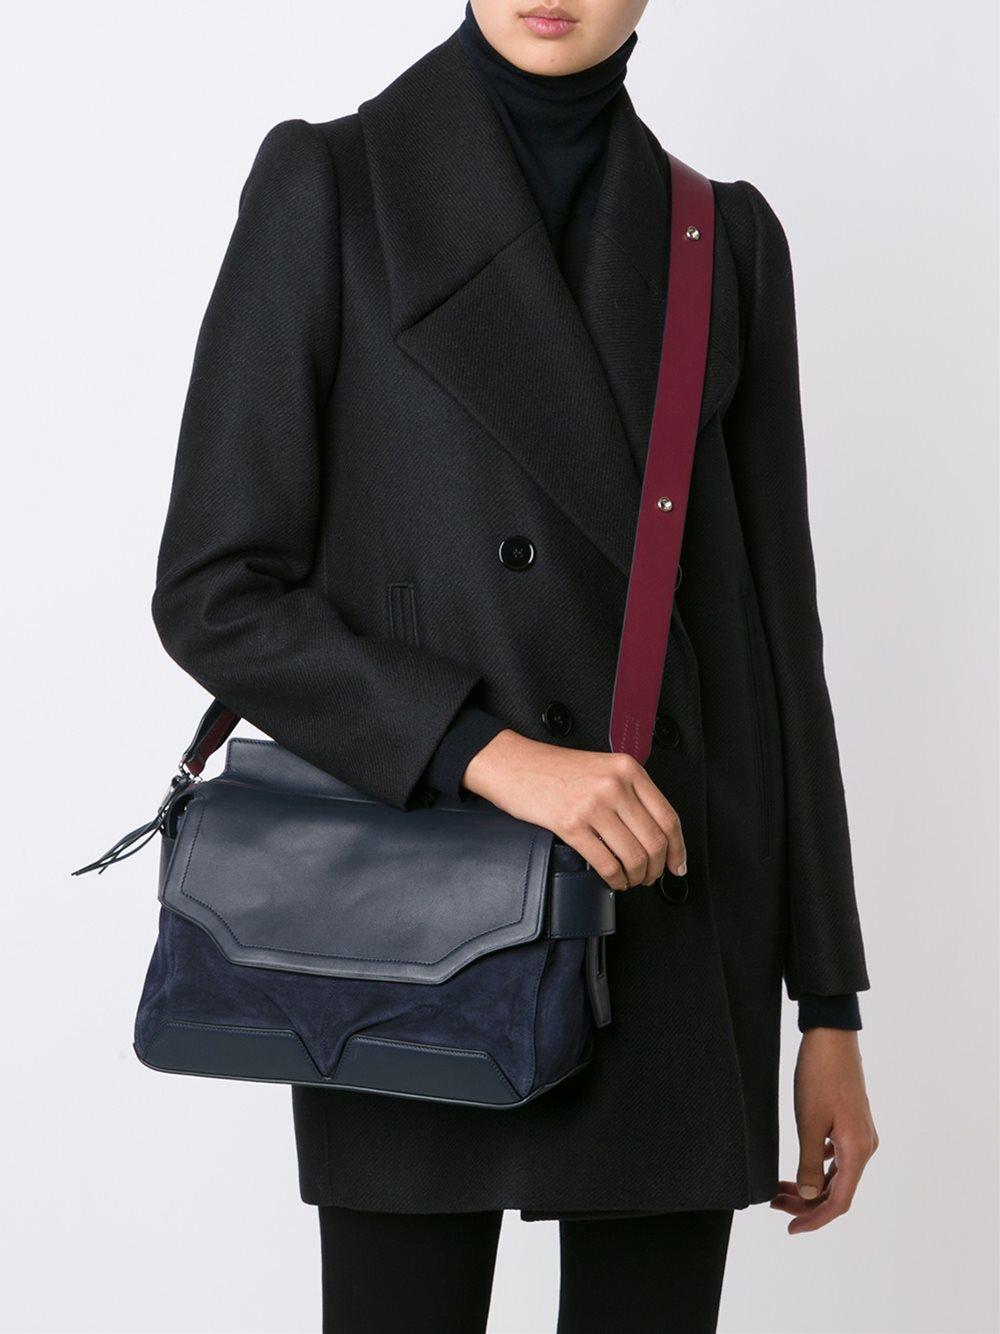 Rag & Bone Leather Flap Closure Tote Bag in Blue